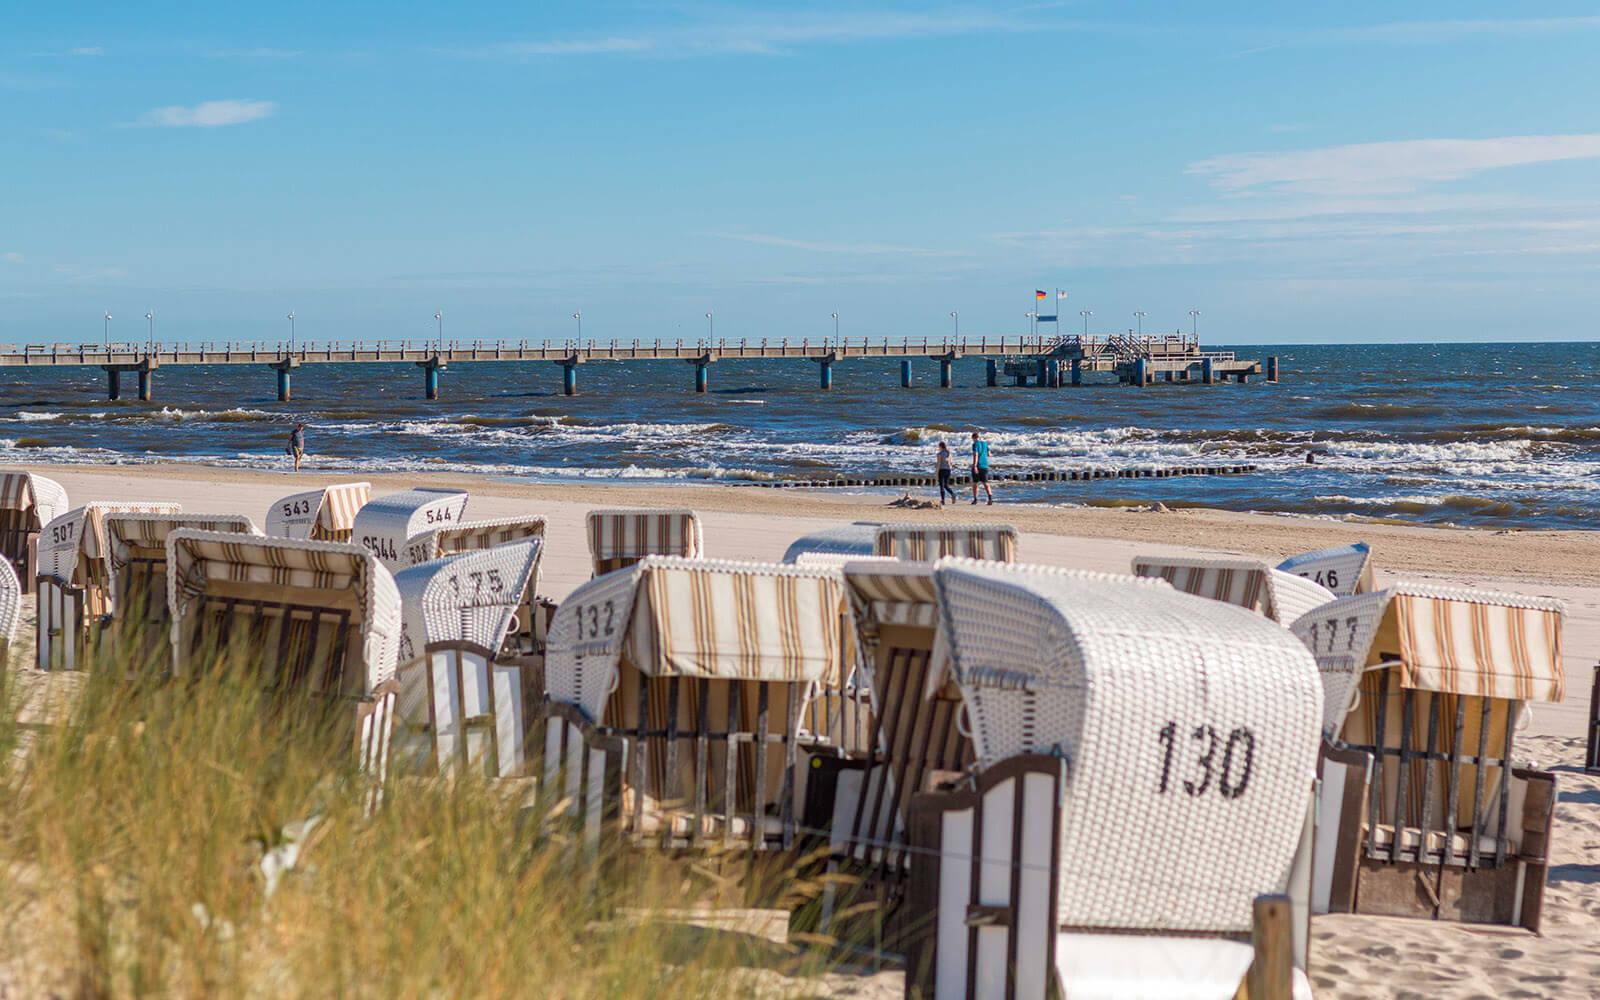 Plaża imolo wAhlbeck